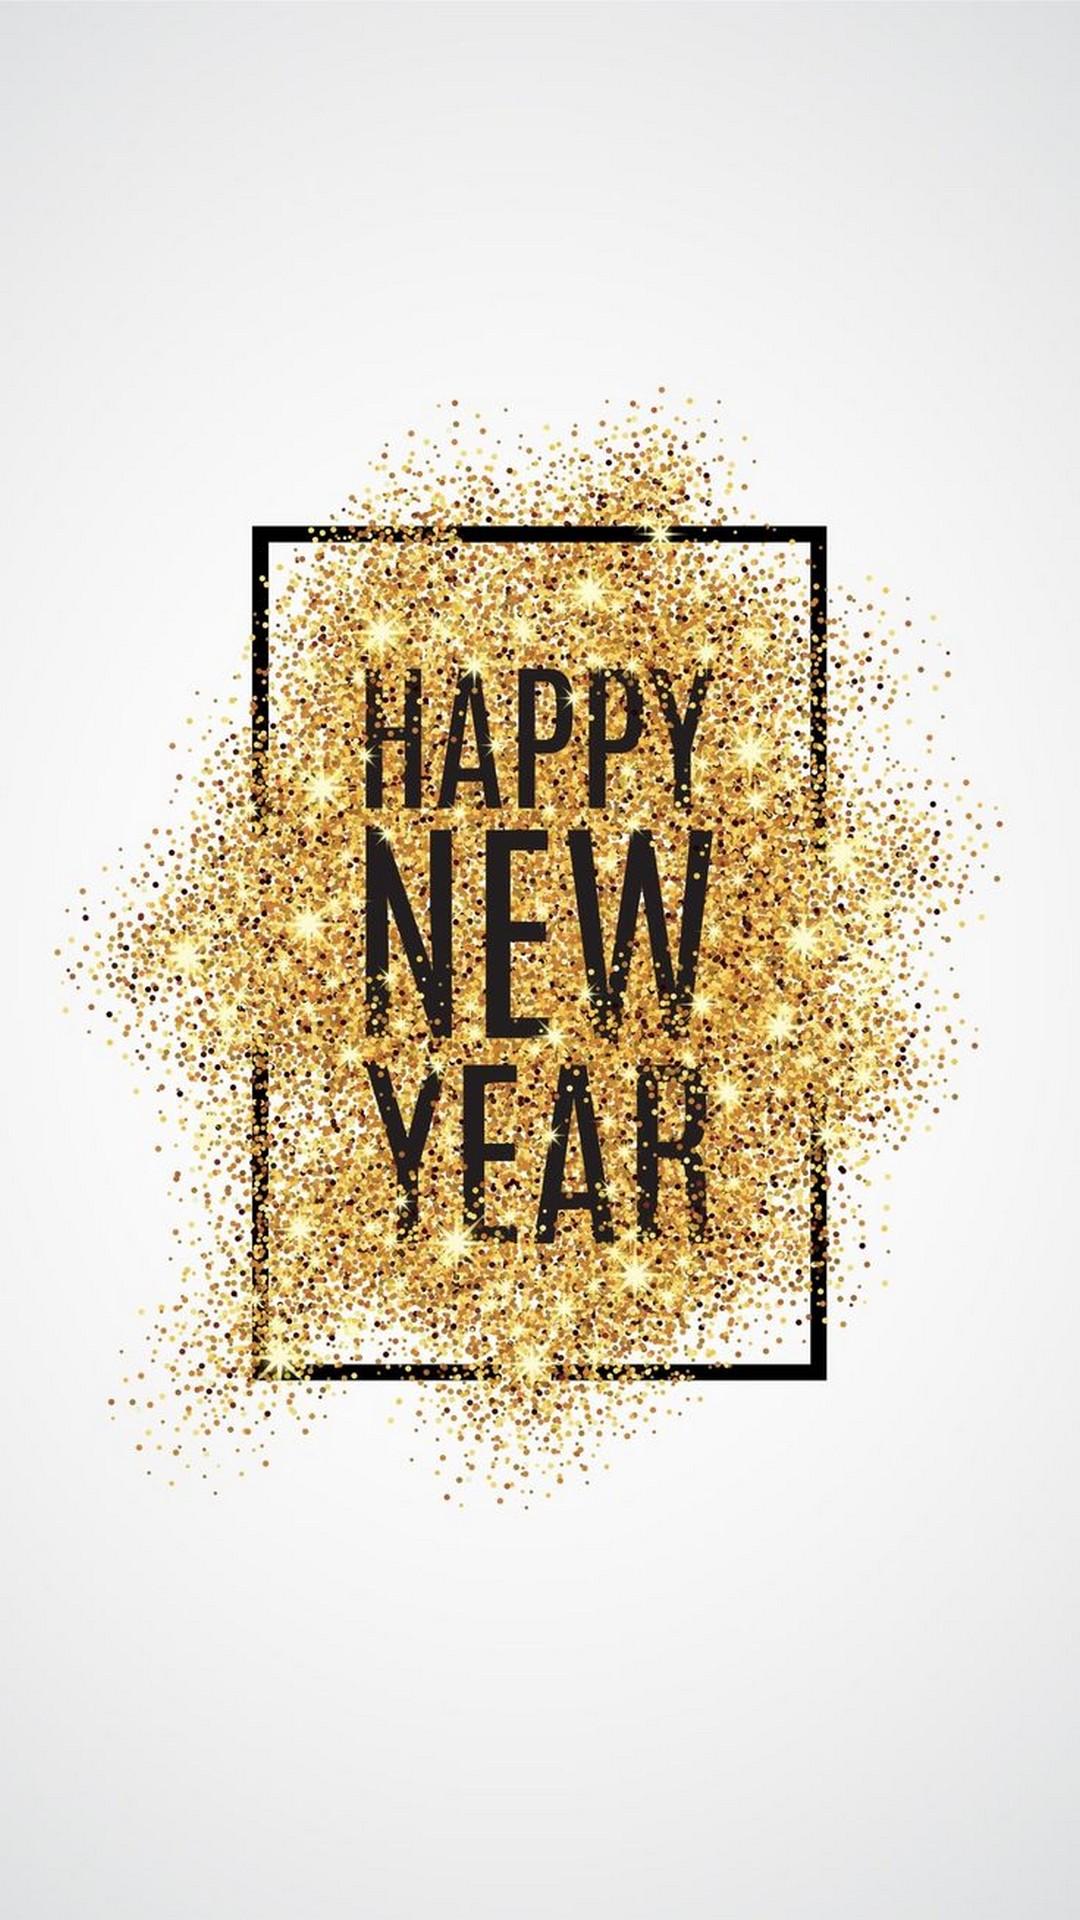 iPhone X Wallpaper Happy New Year 2018 2020 3D iPhone Wallpaper 1080x1920